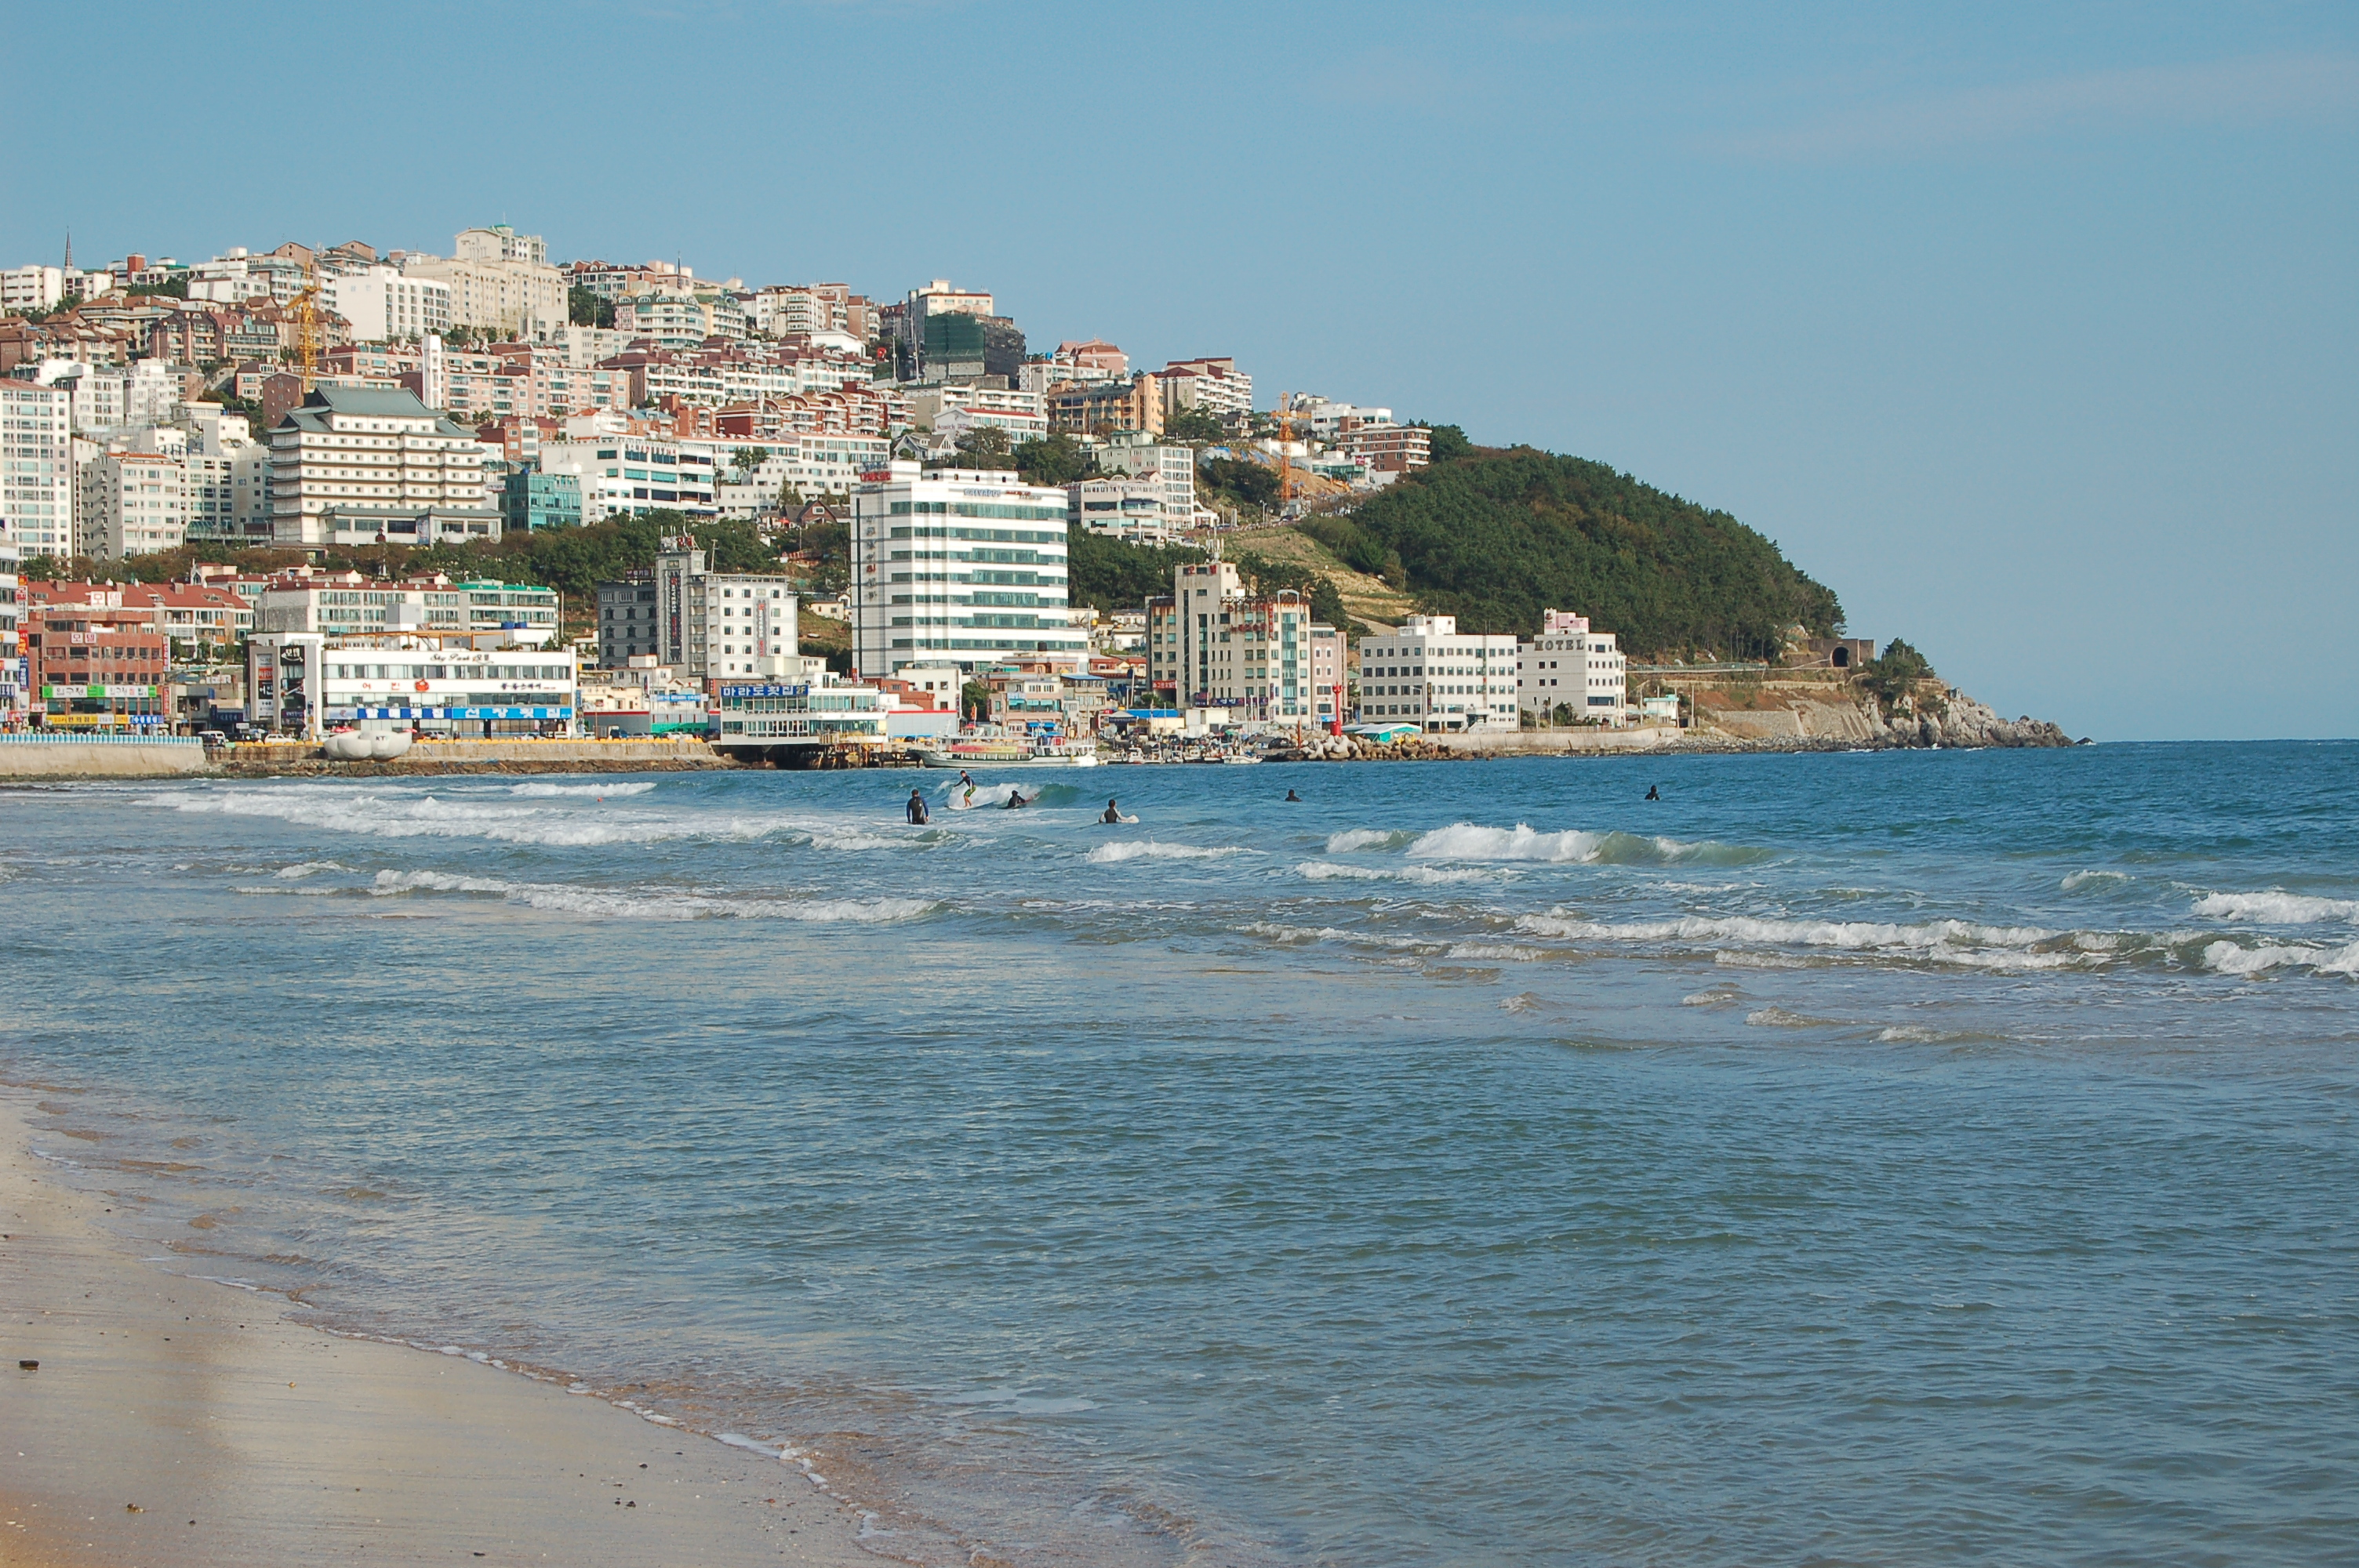 Filekorea Busan Haeundae Beach  Jpg